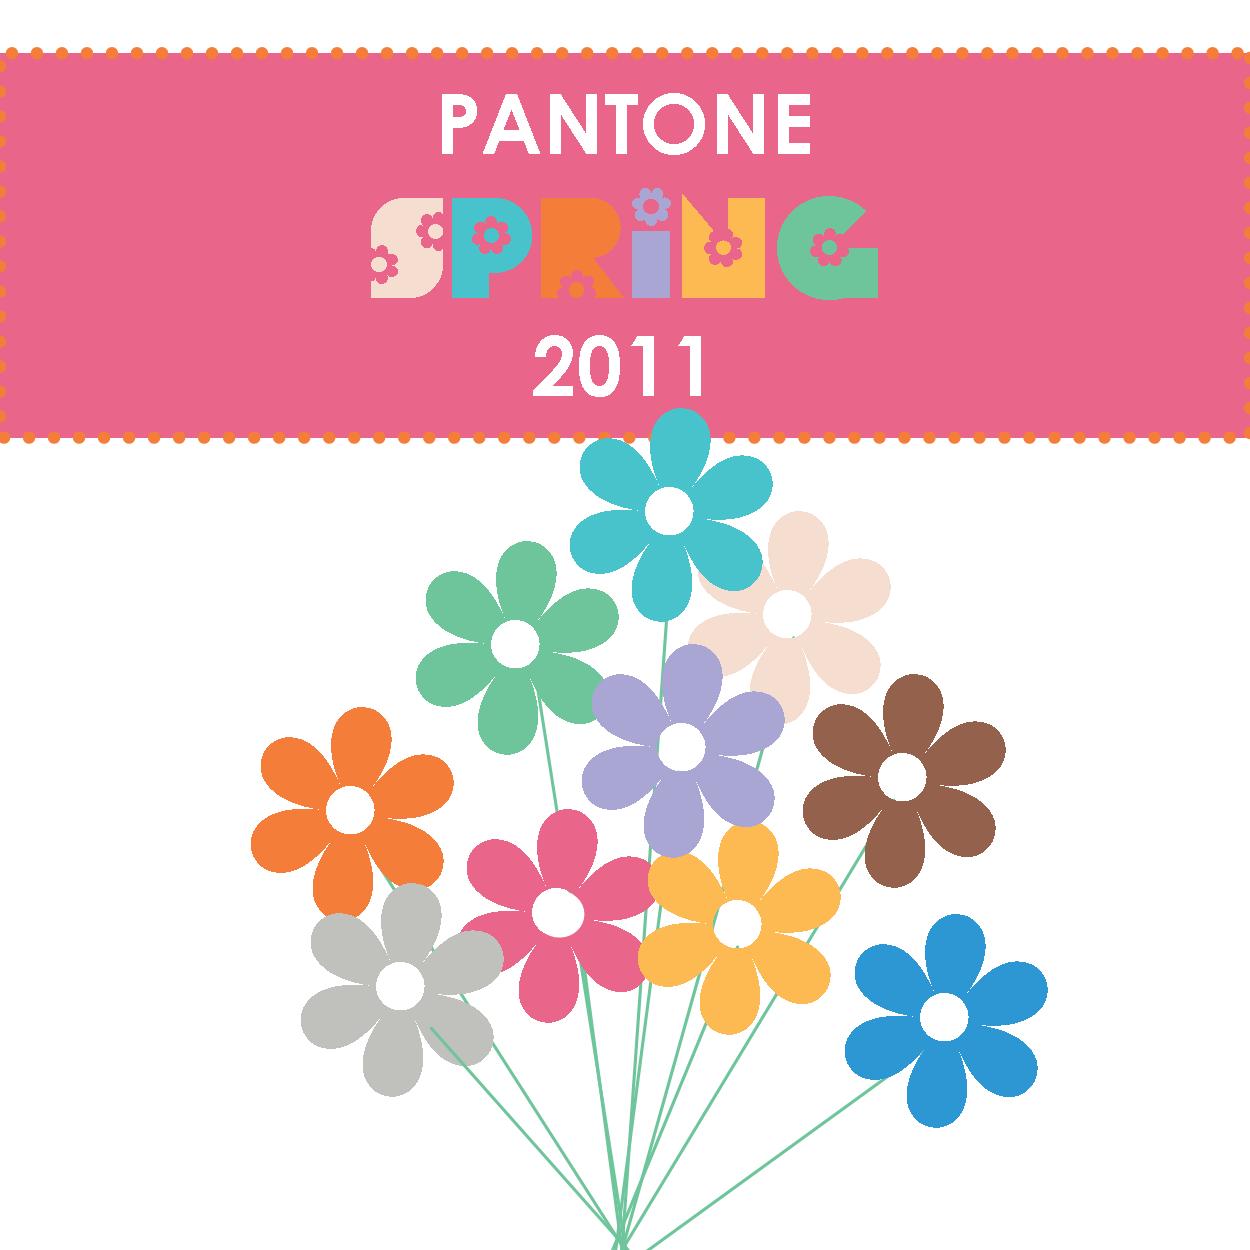 Pantone Spring 2011 For Spring 2011